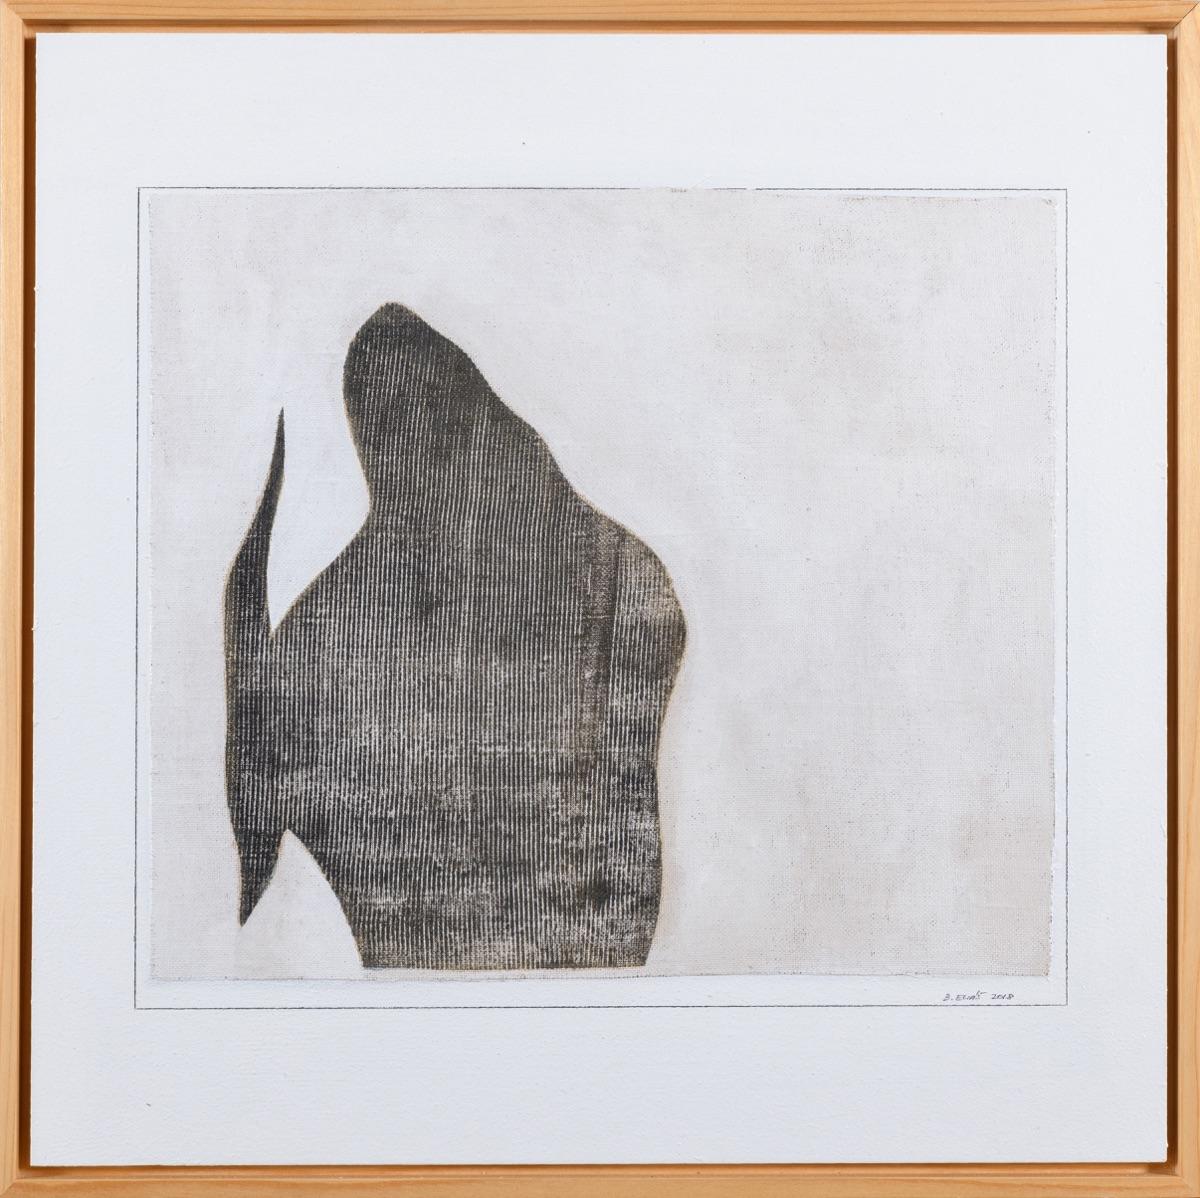 BOHUMIL ELIÁŠ ML. Torso 48 x 48 cm